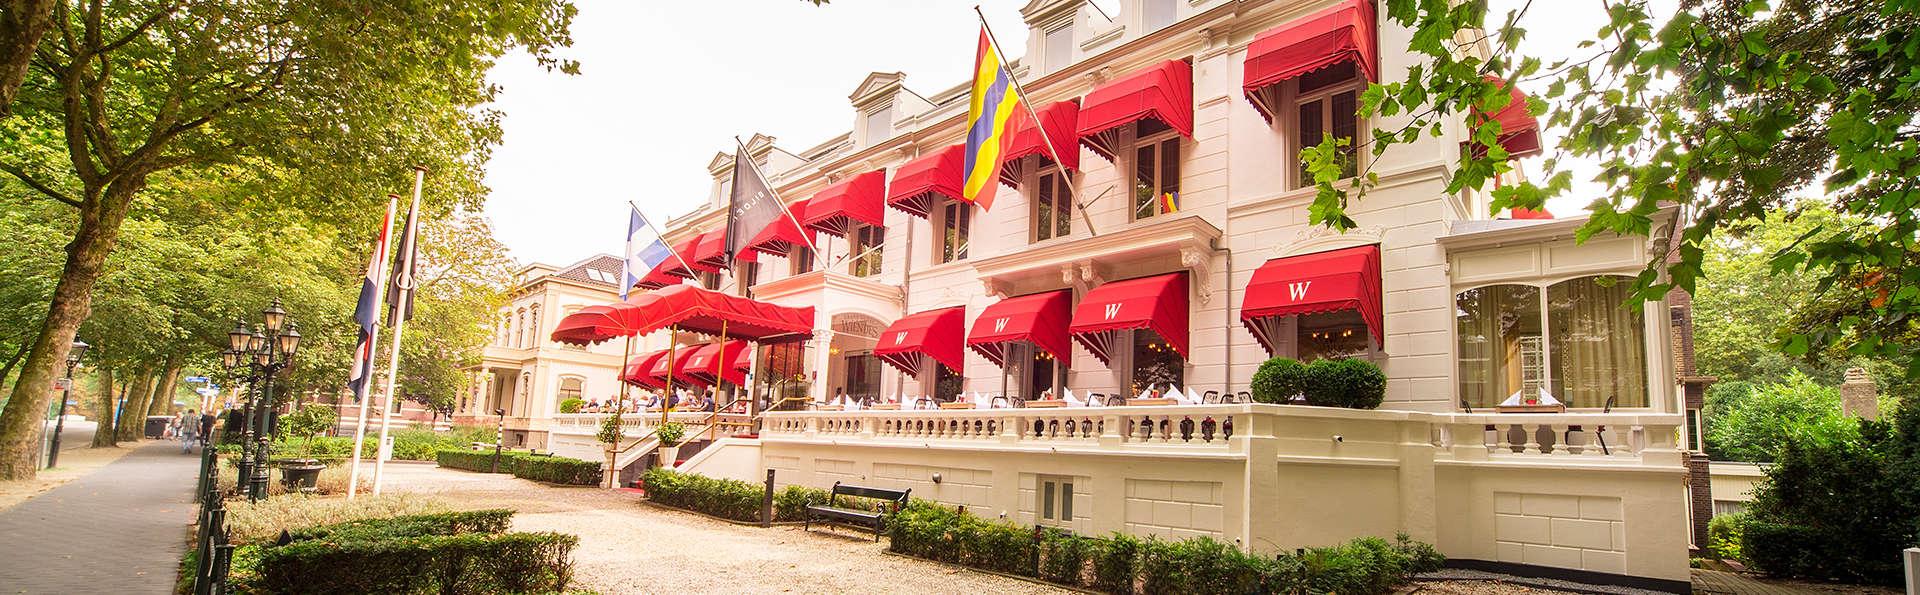 Bilderberg Grand Hotel Wientjes - EDIT_front.jpg